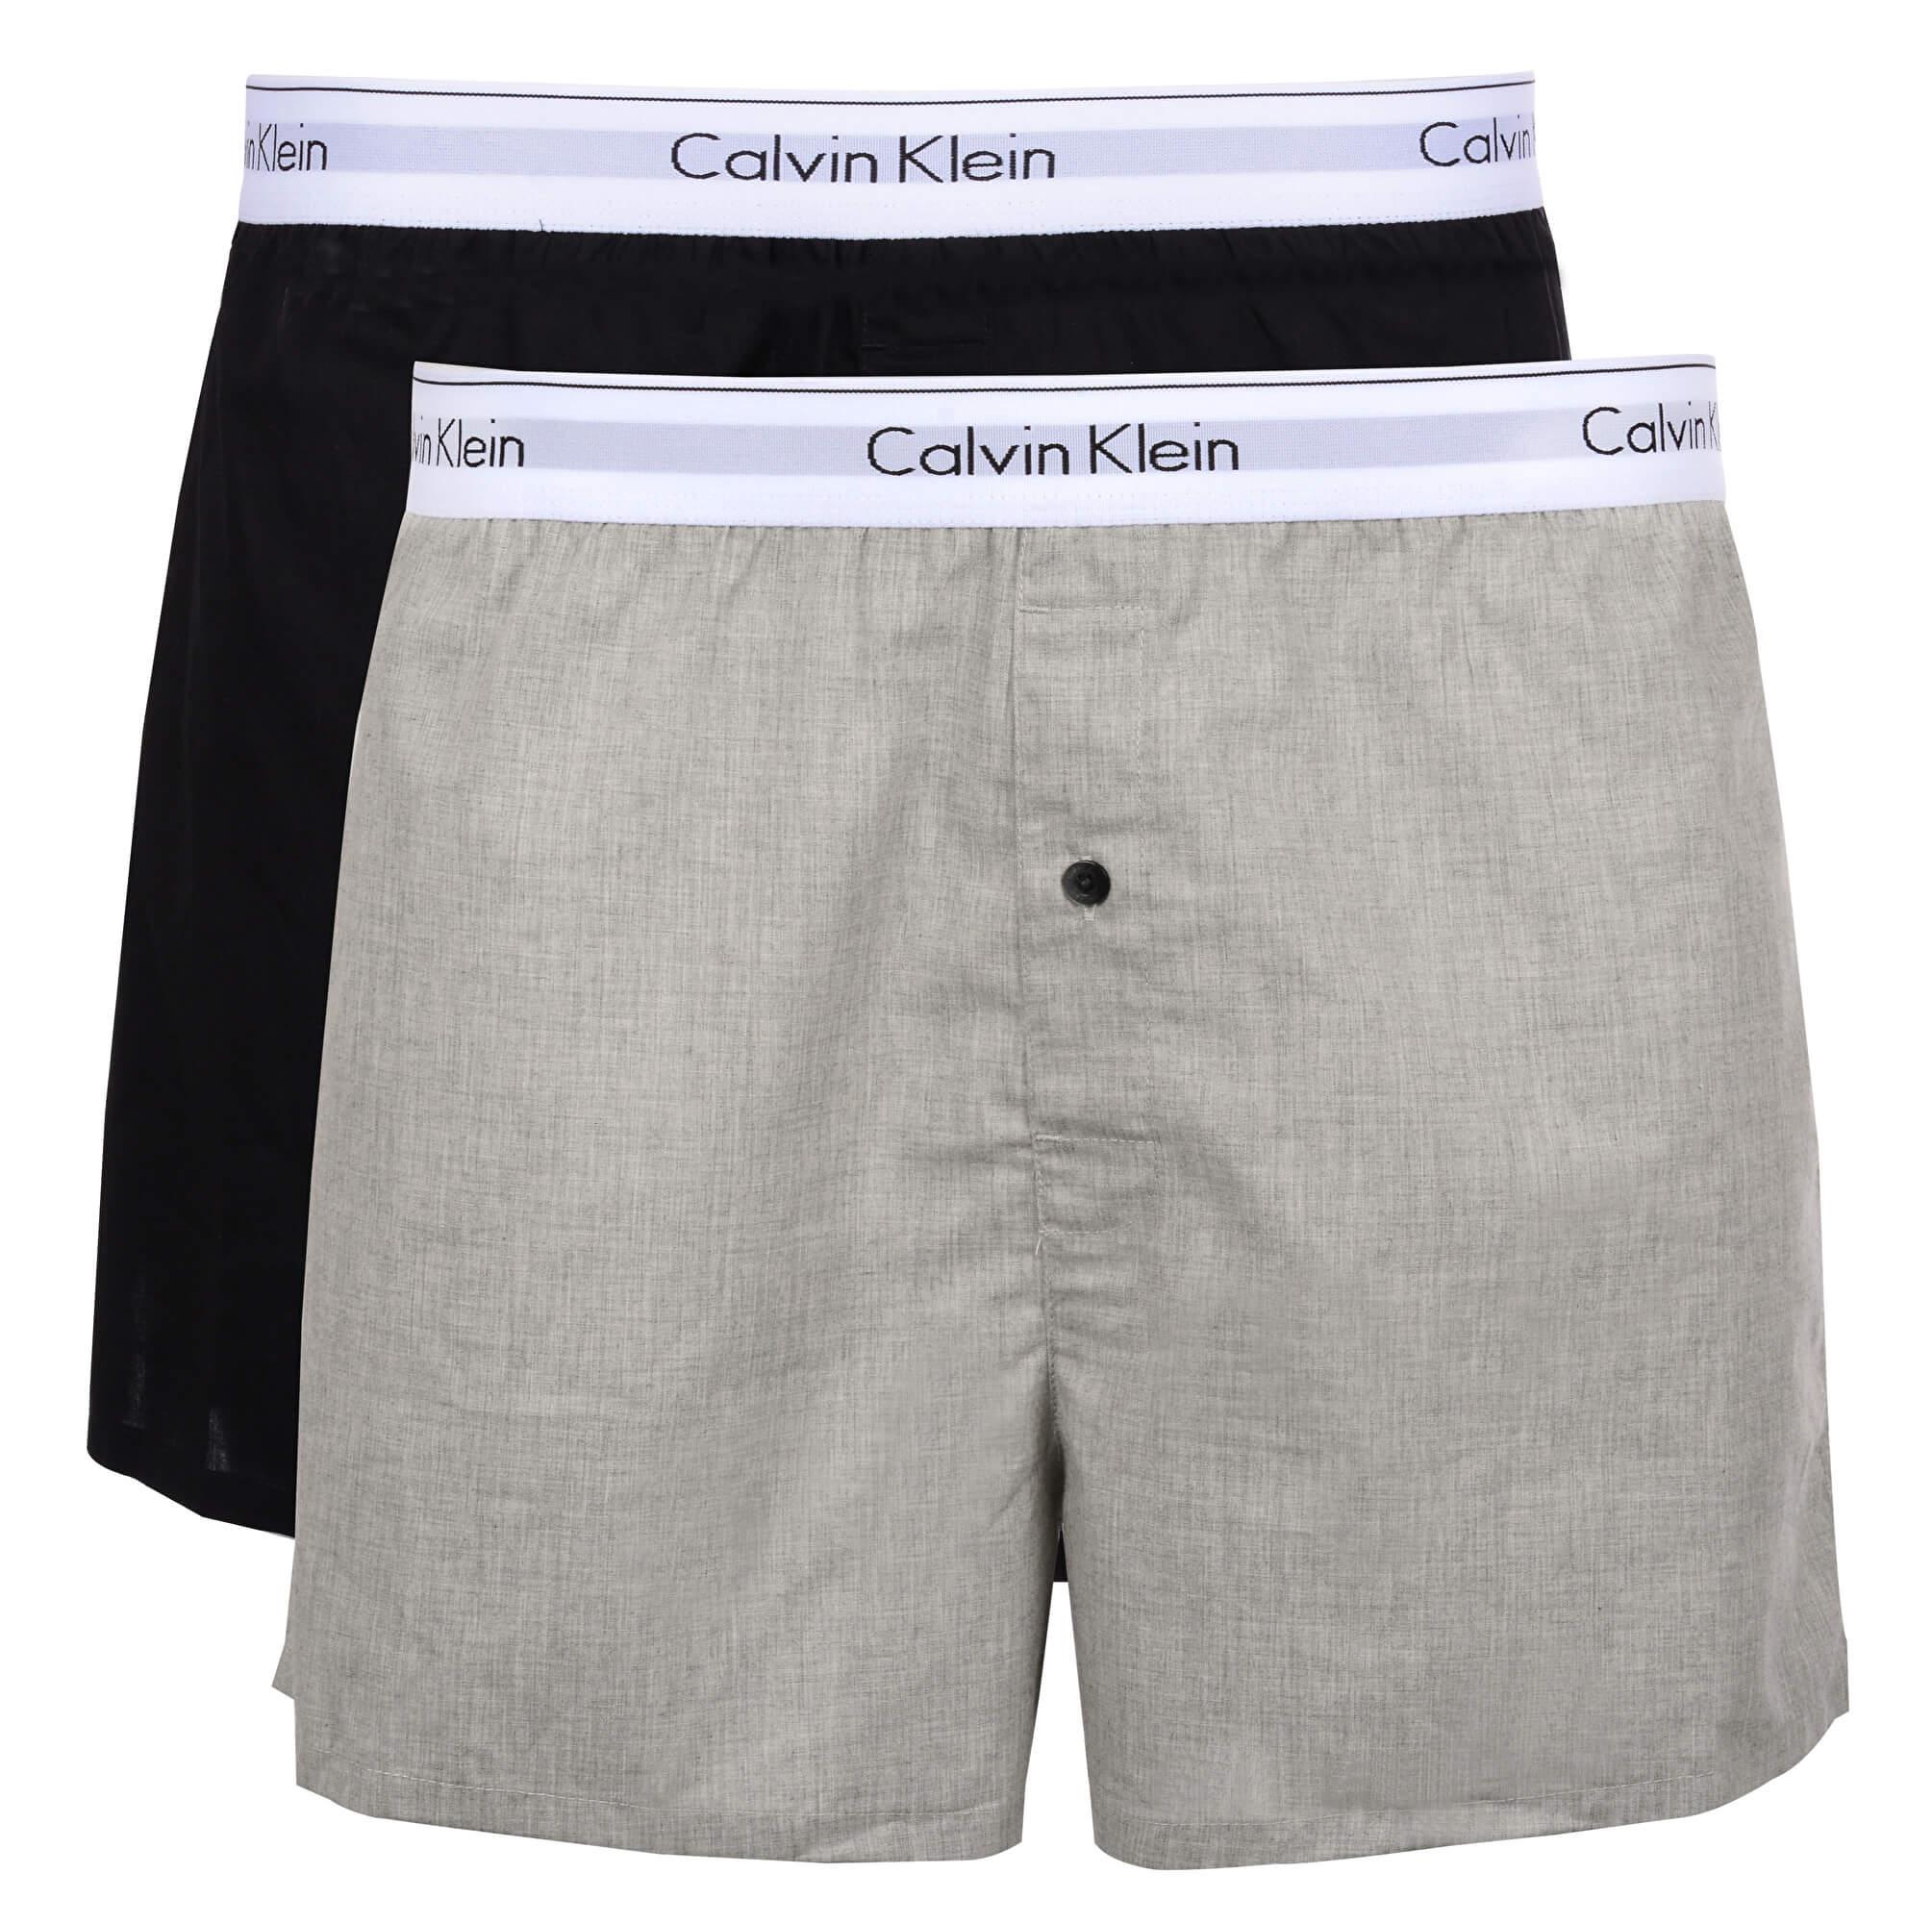 e7f5d8f711c7f Calvin Klein Pantaloni scurti Modern Cotton Stretch Slim Boxer 2P  NB1396A-BHY